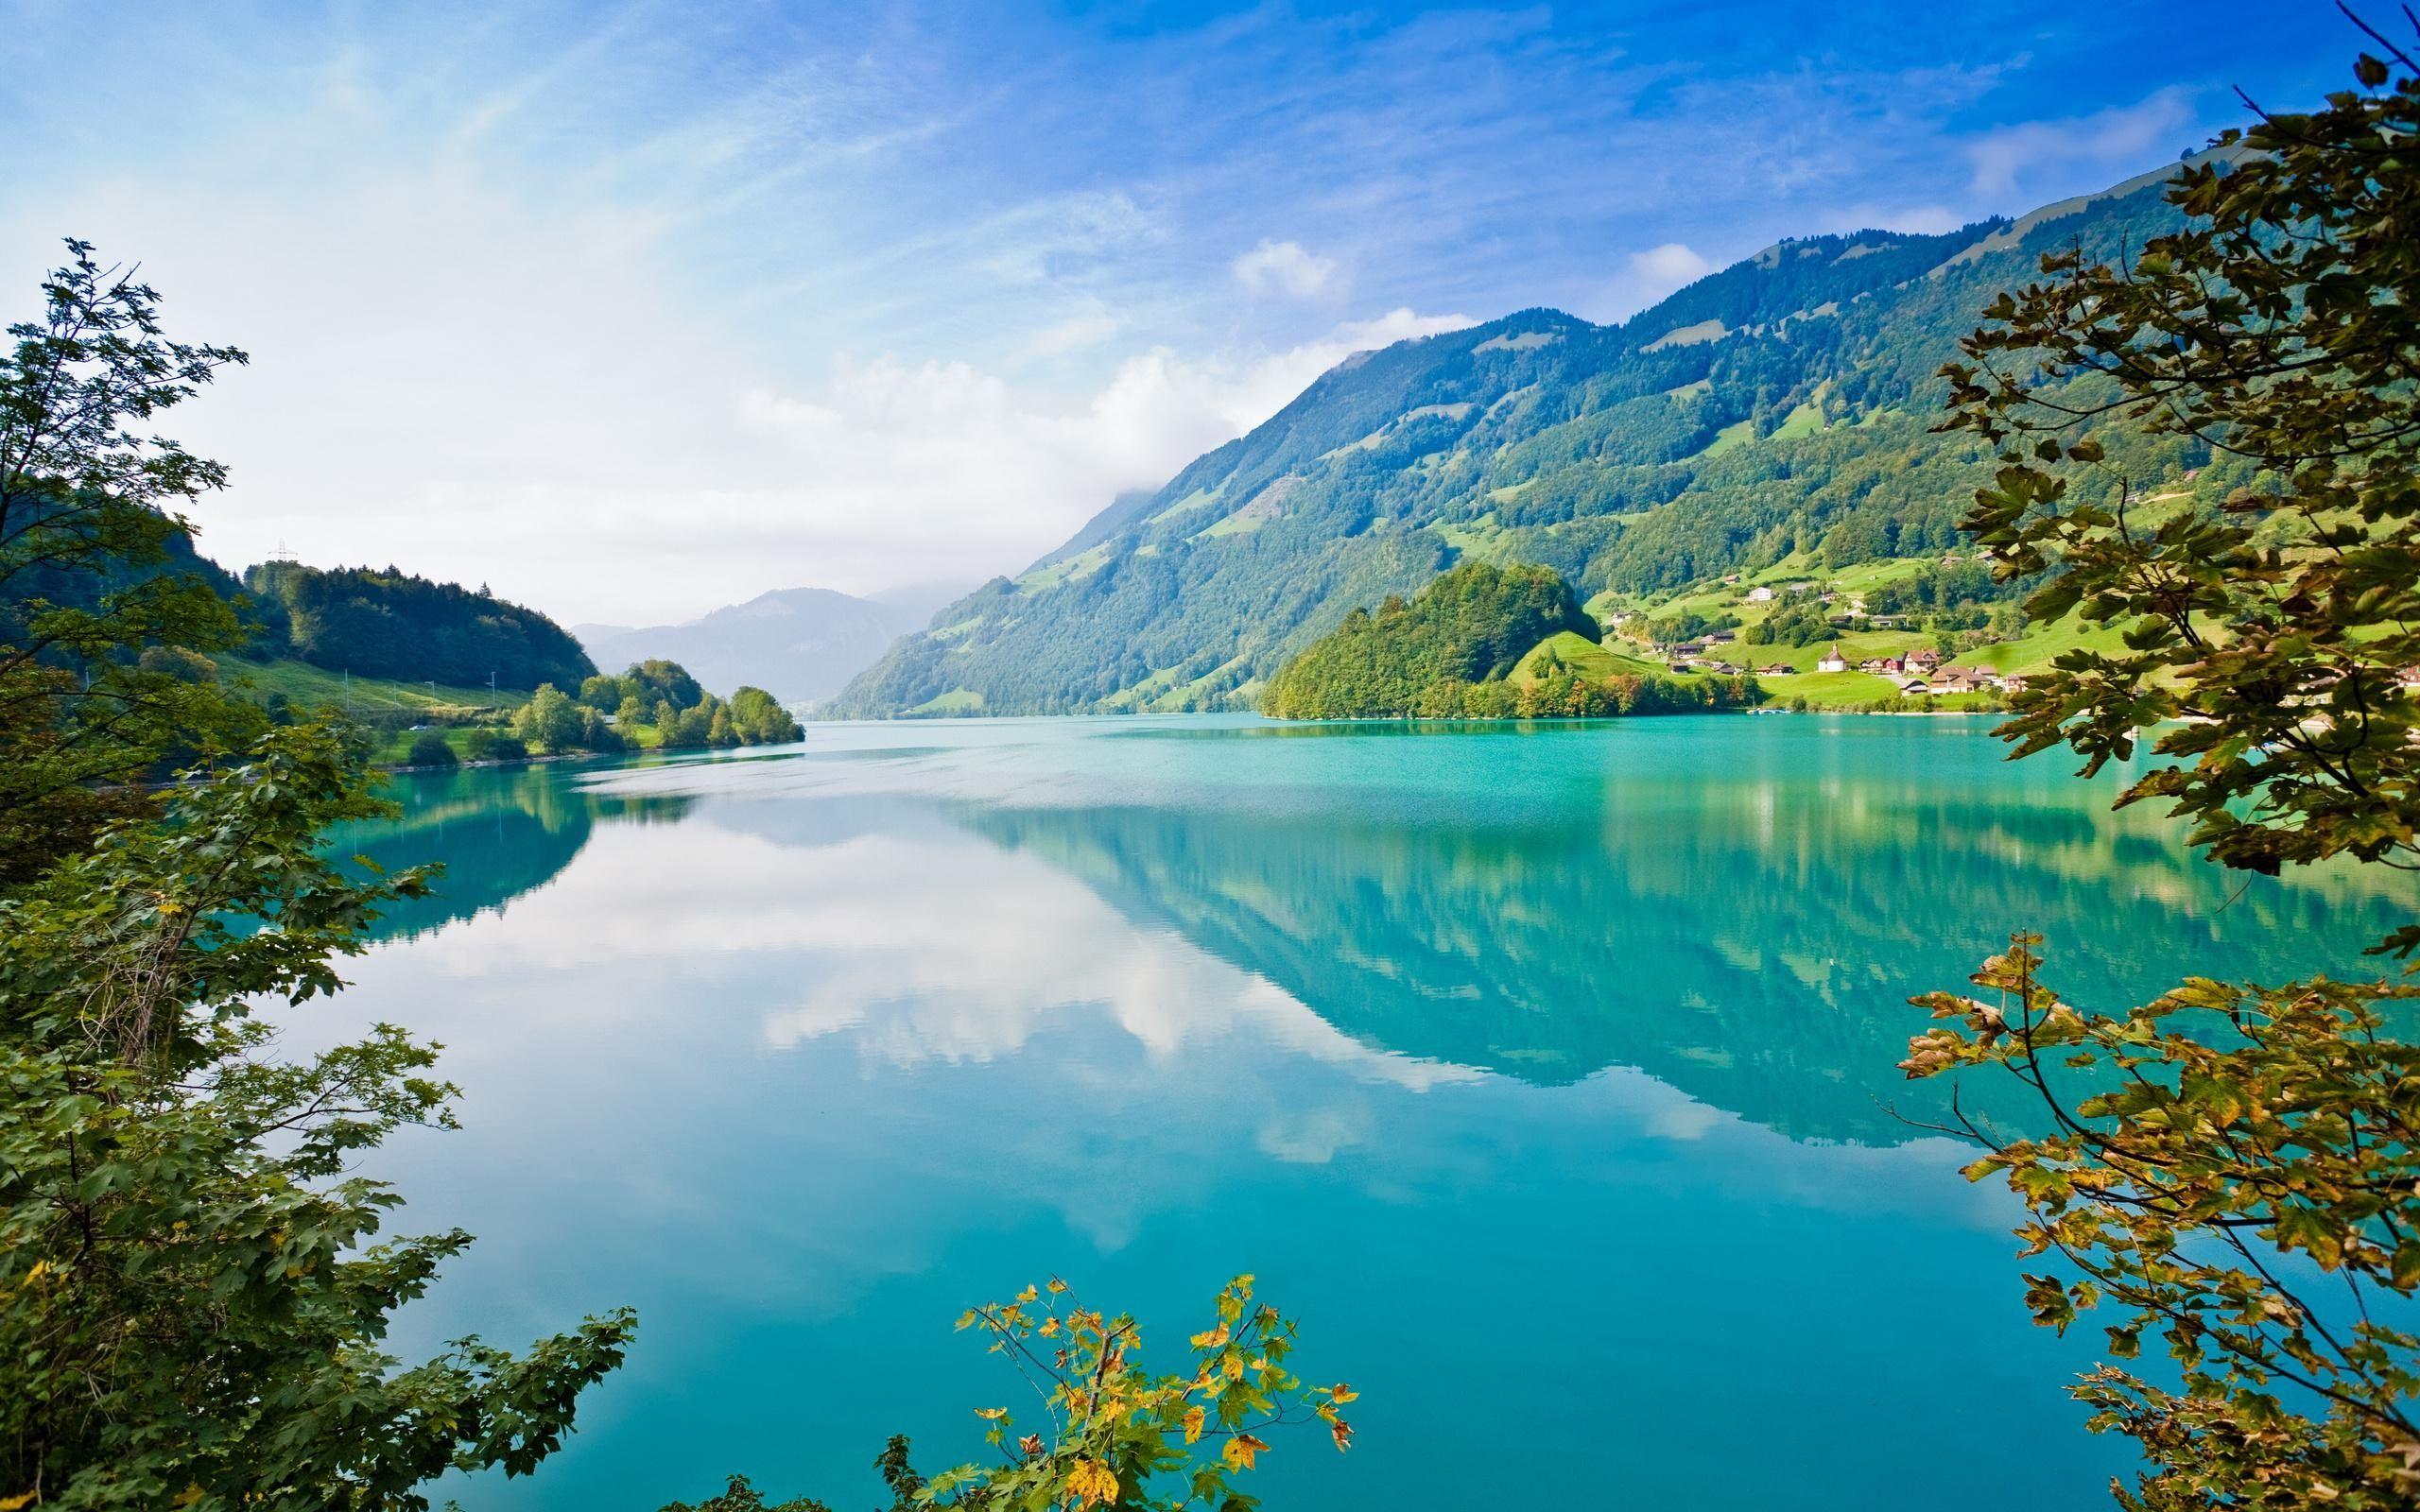 green lake beautiful landscape wallpaper for desktop laptop pc mobile free download